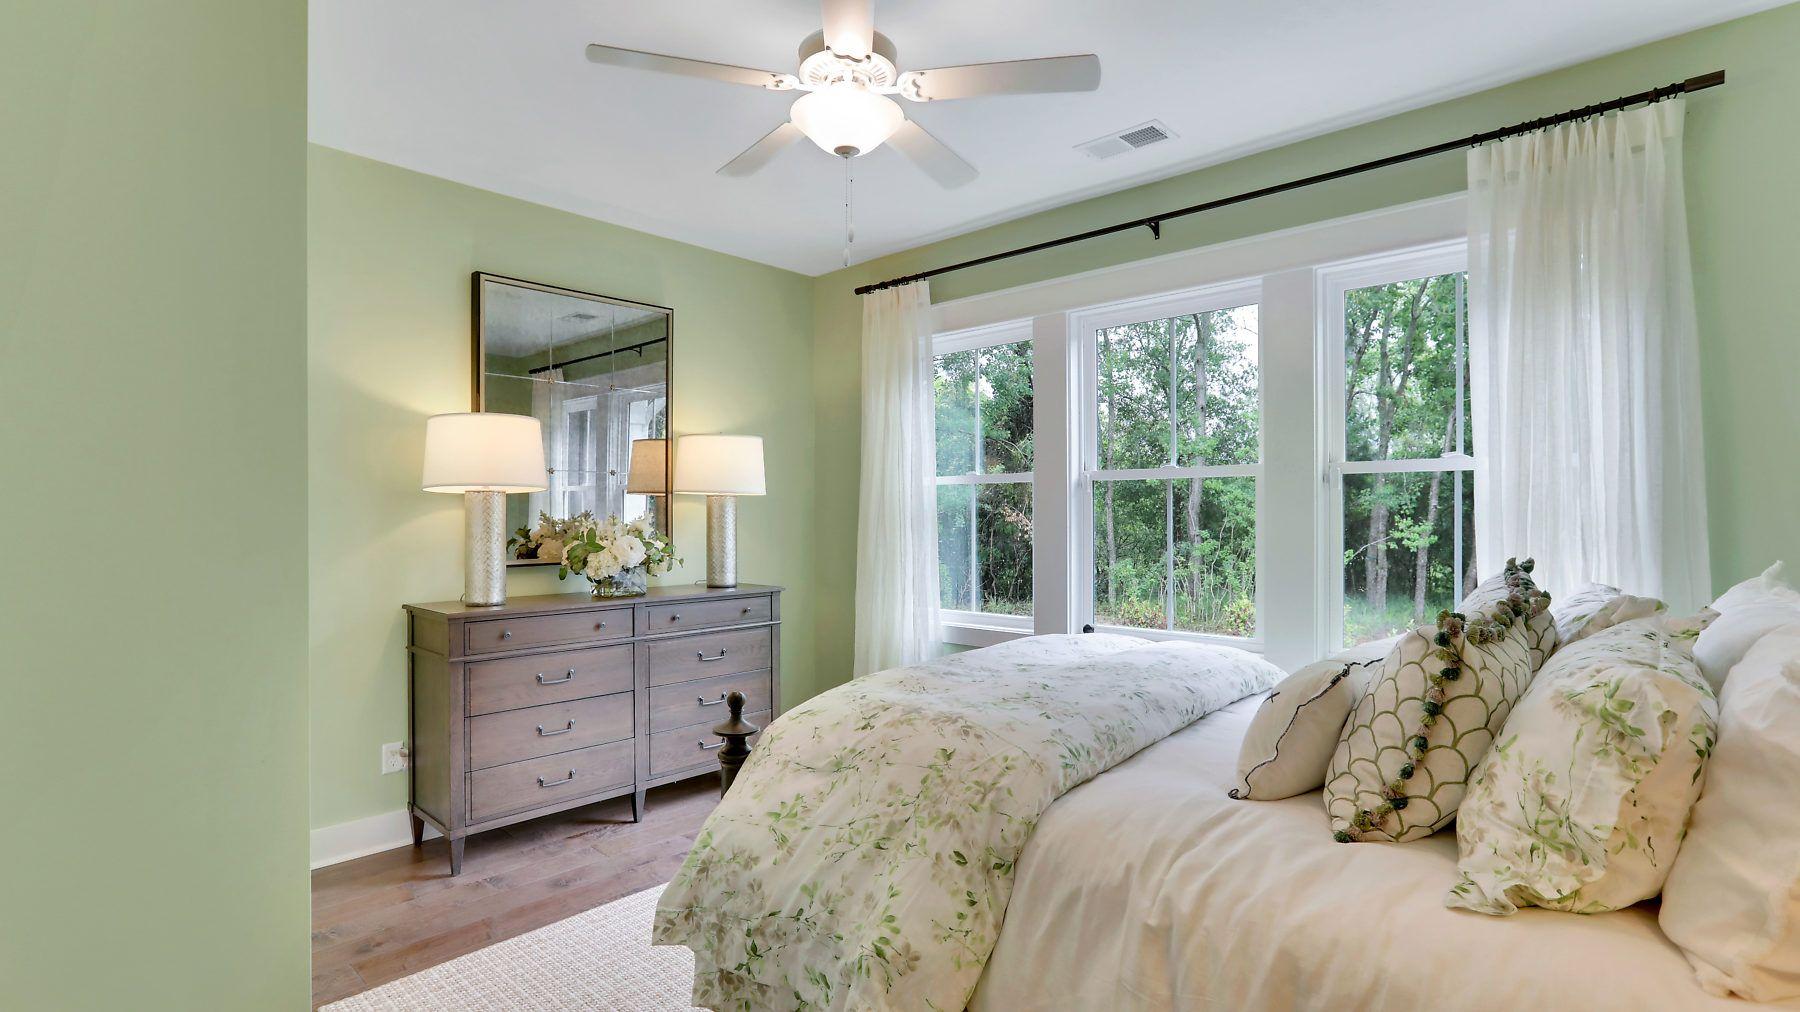 Bedroom featured in The Pinehurst By Village Park Homes in Savannah, GA